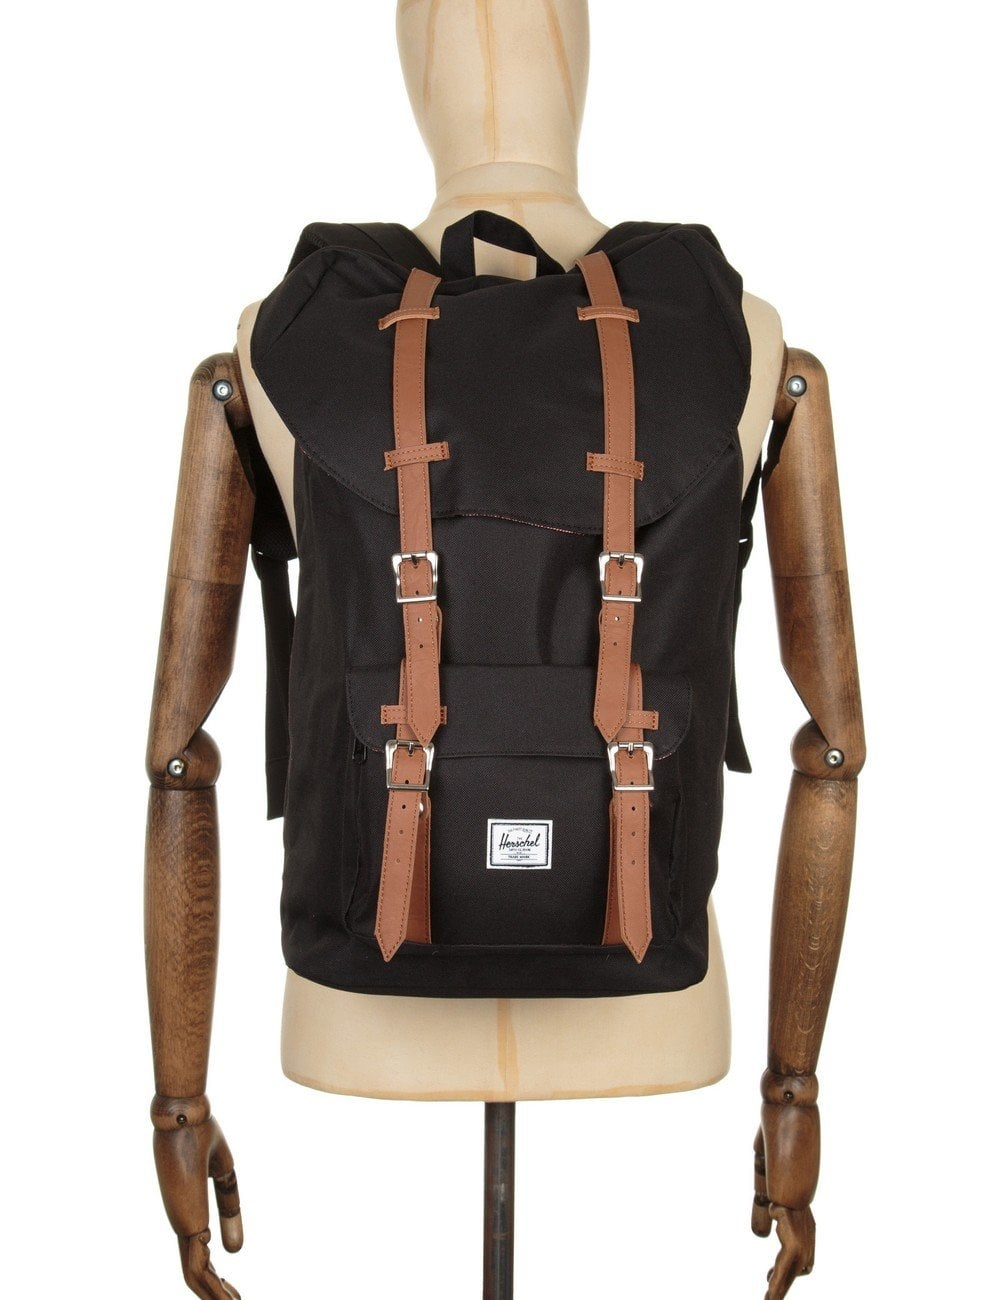 4168132ec86 Herschel Supply Co Little America Backpack - Black Tan - Accessories ...